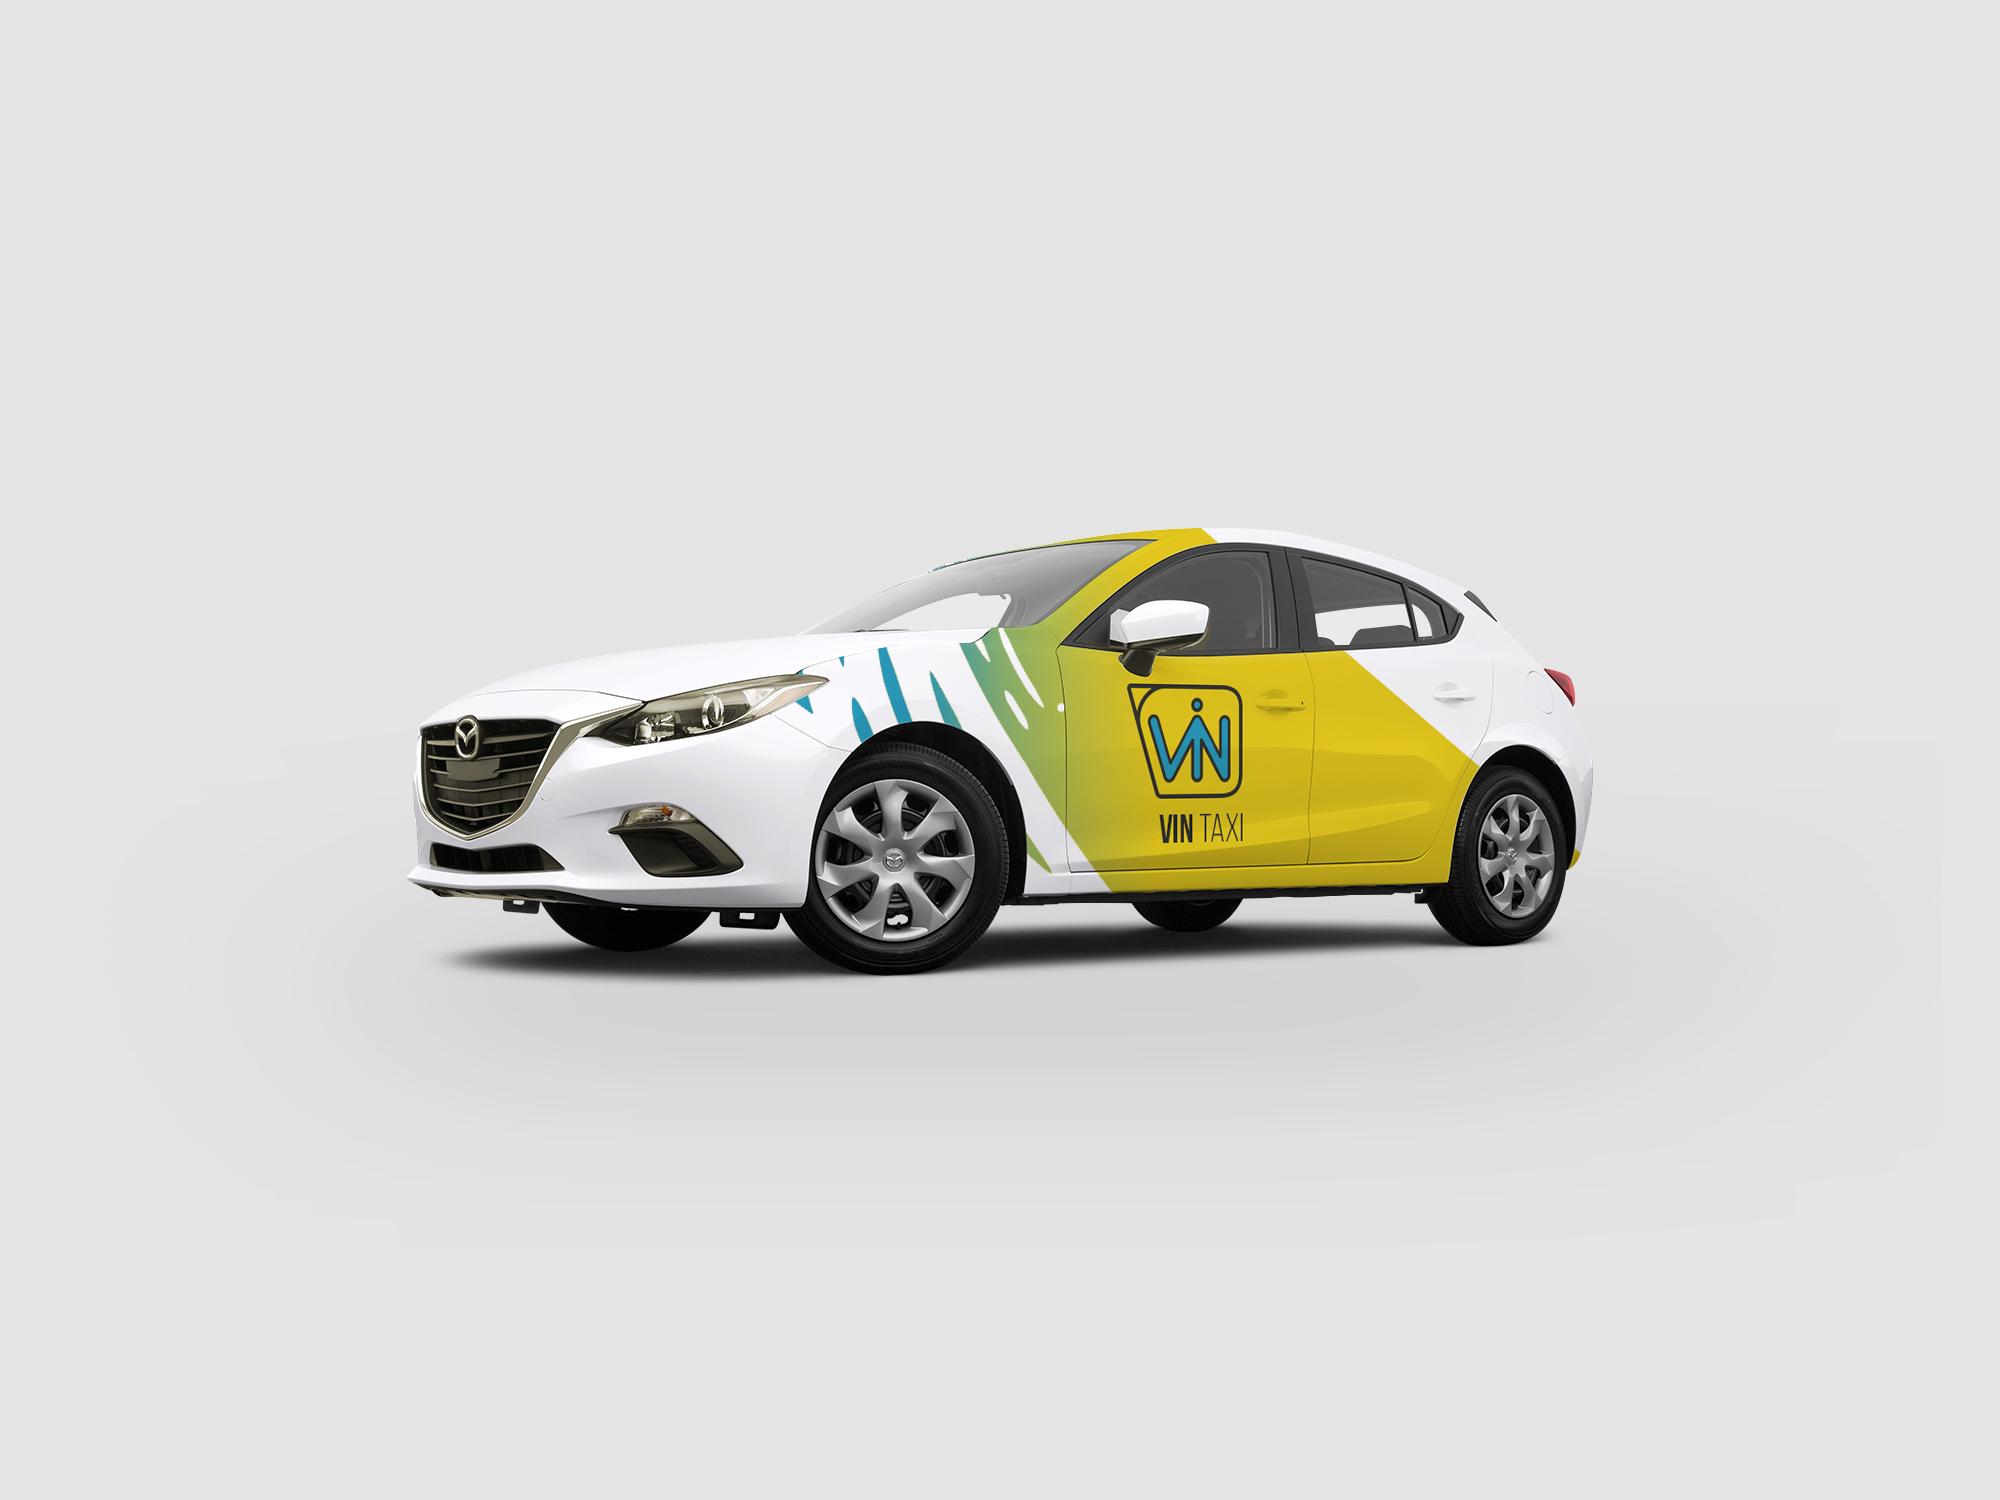 Разработка логотипа и фирменного стиля для такси фото f_5405b9ce8ce87670.jpg